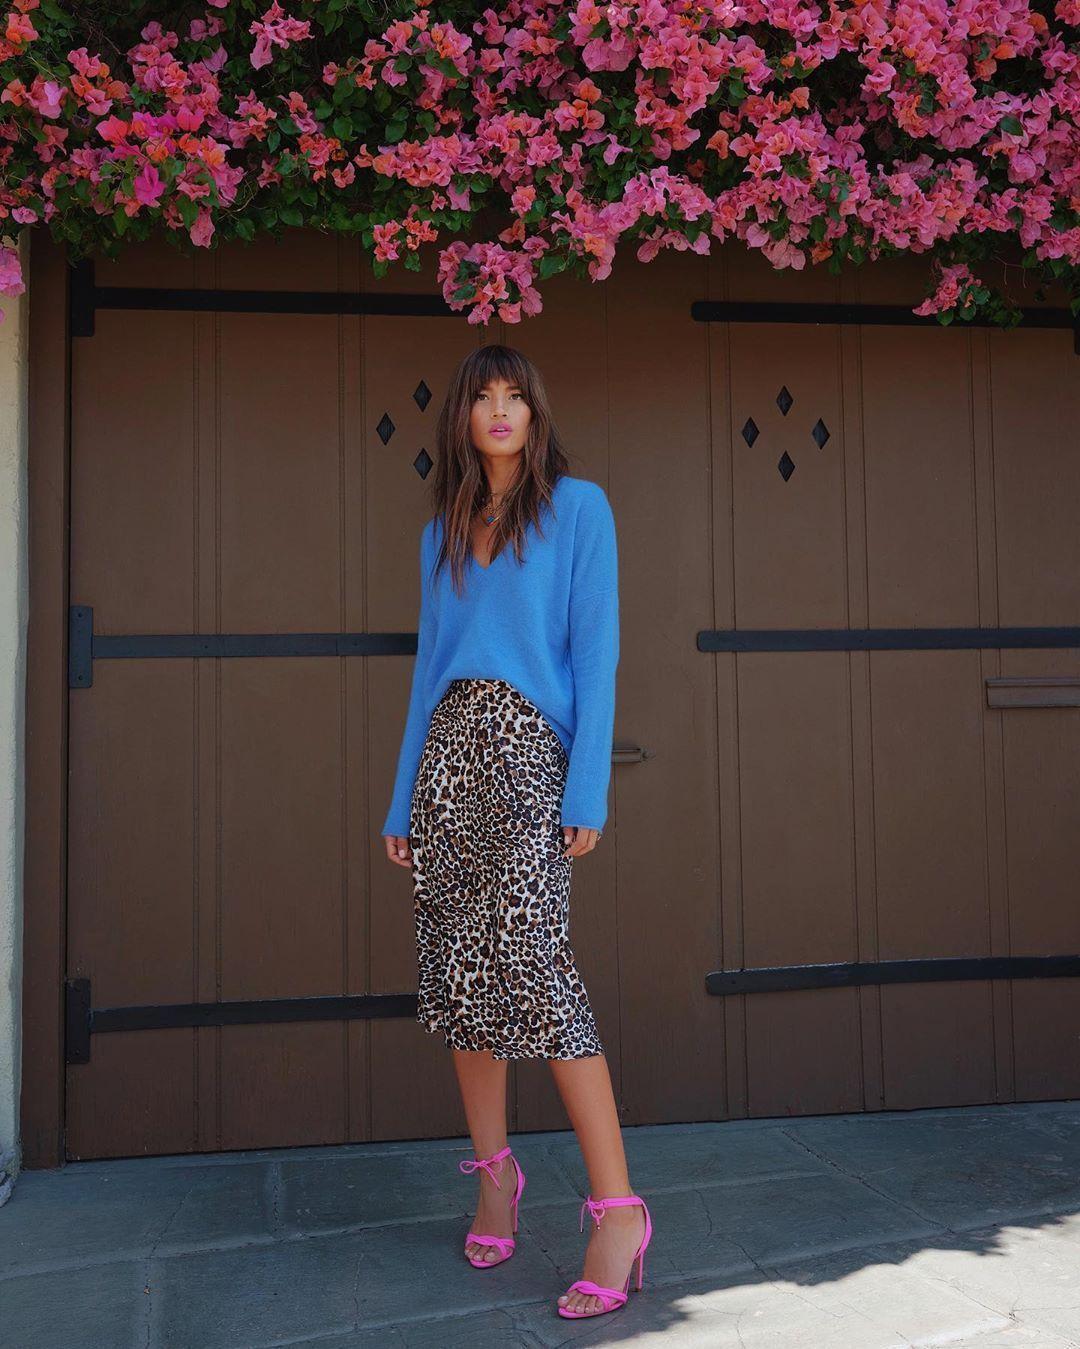 Get the skirt for $60 at express.com – Wheretoget